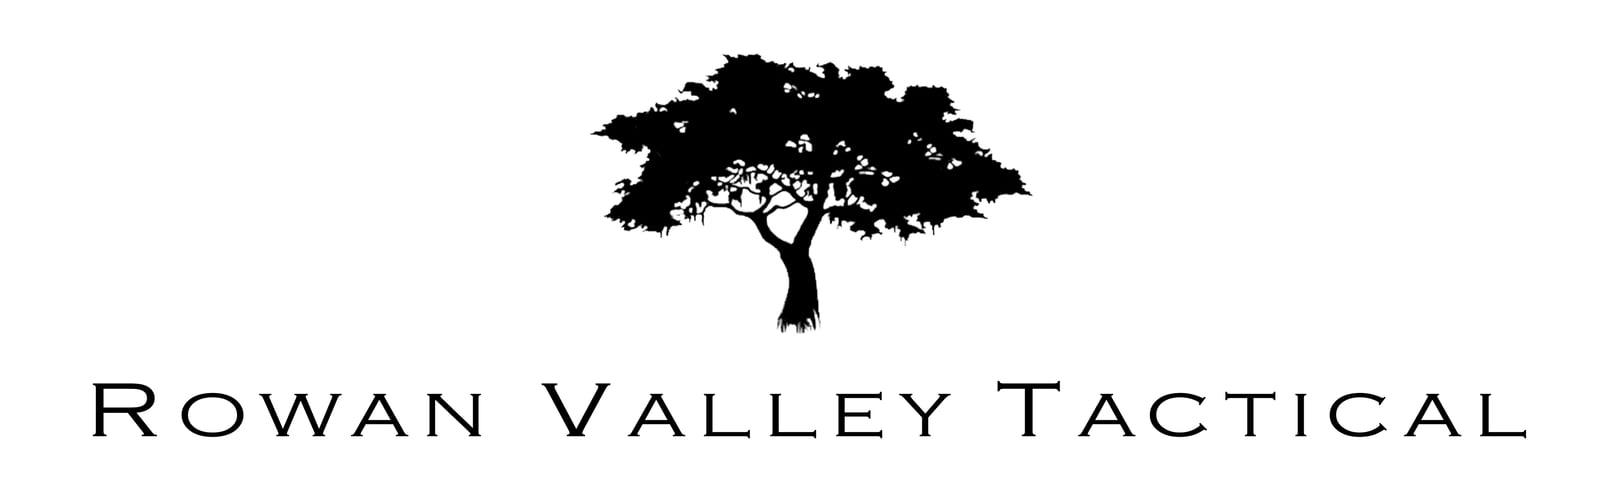 Rowan Valley Tactical